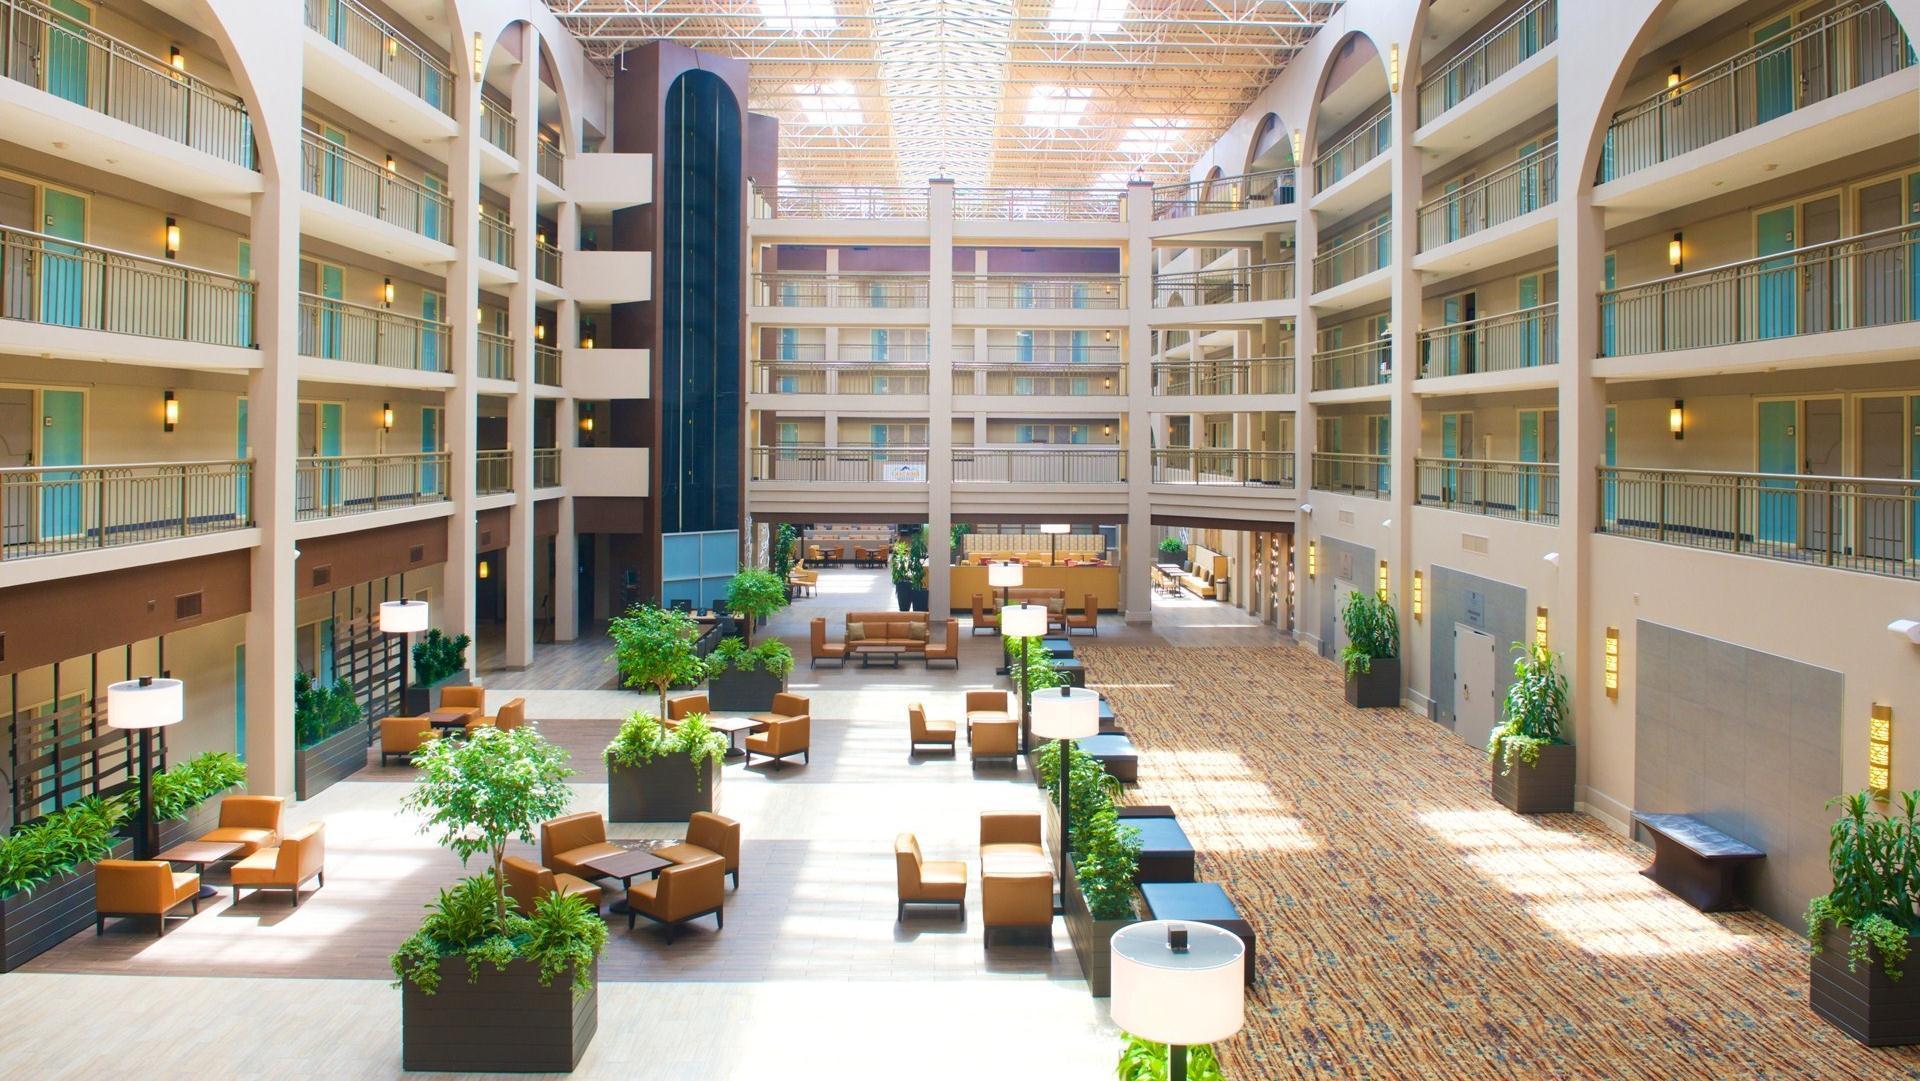 Embassy Suites by Hilton Seattle Bellevue. Bellevue, WA Hotel